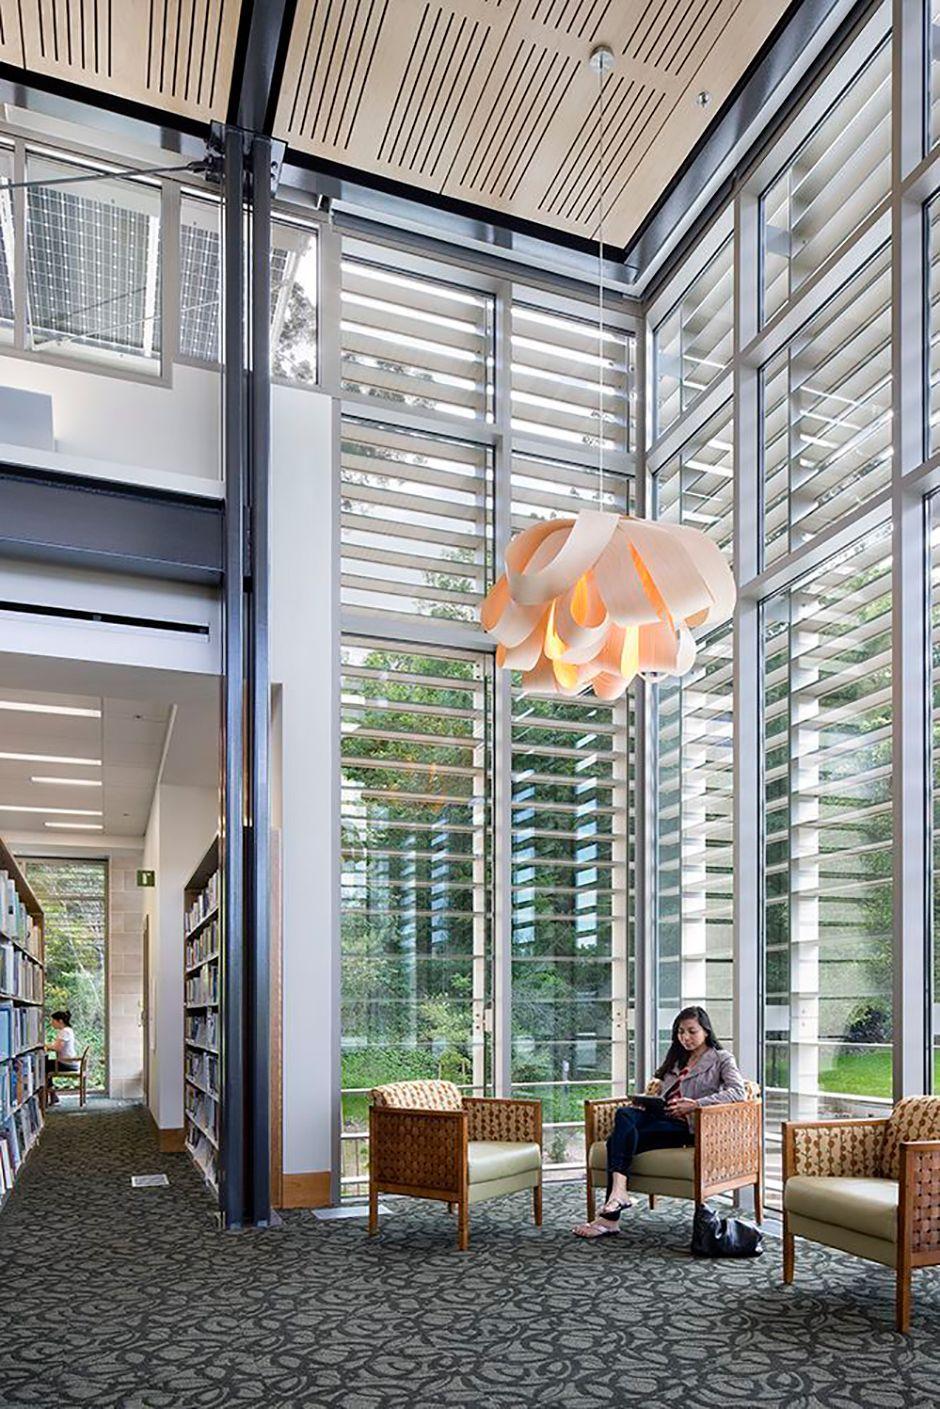 #Agatha Lamp Biblioteca Los Gatos, California Unique wood lighting design since 1994  #WoodLighting